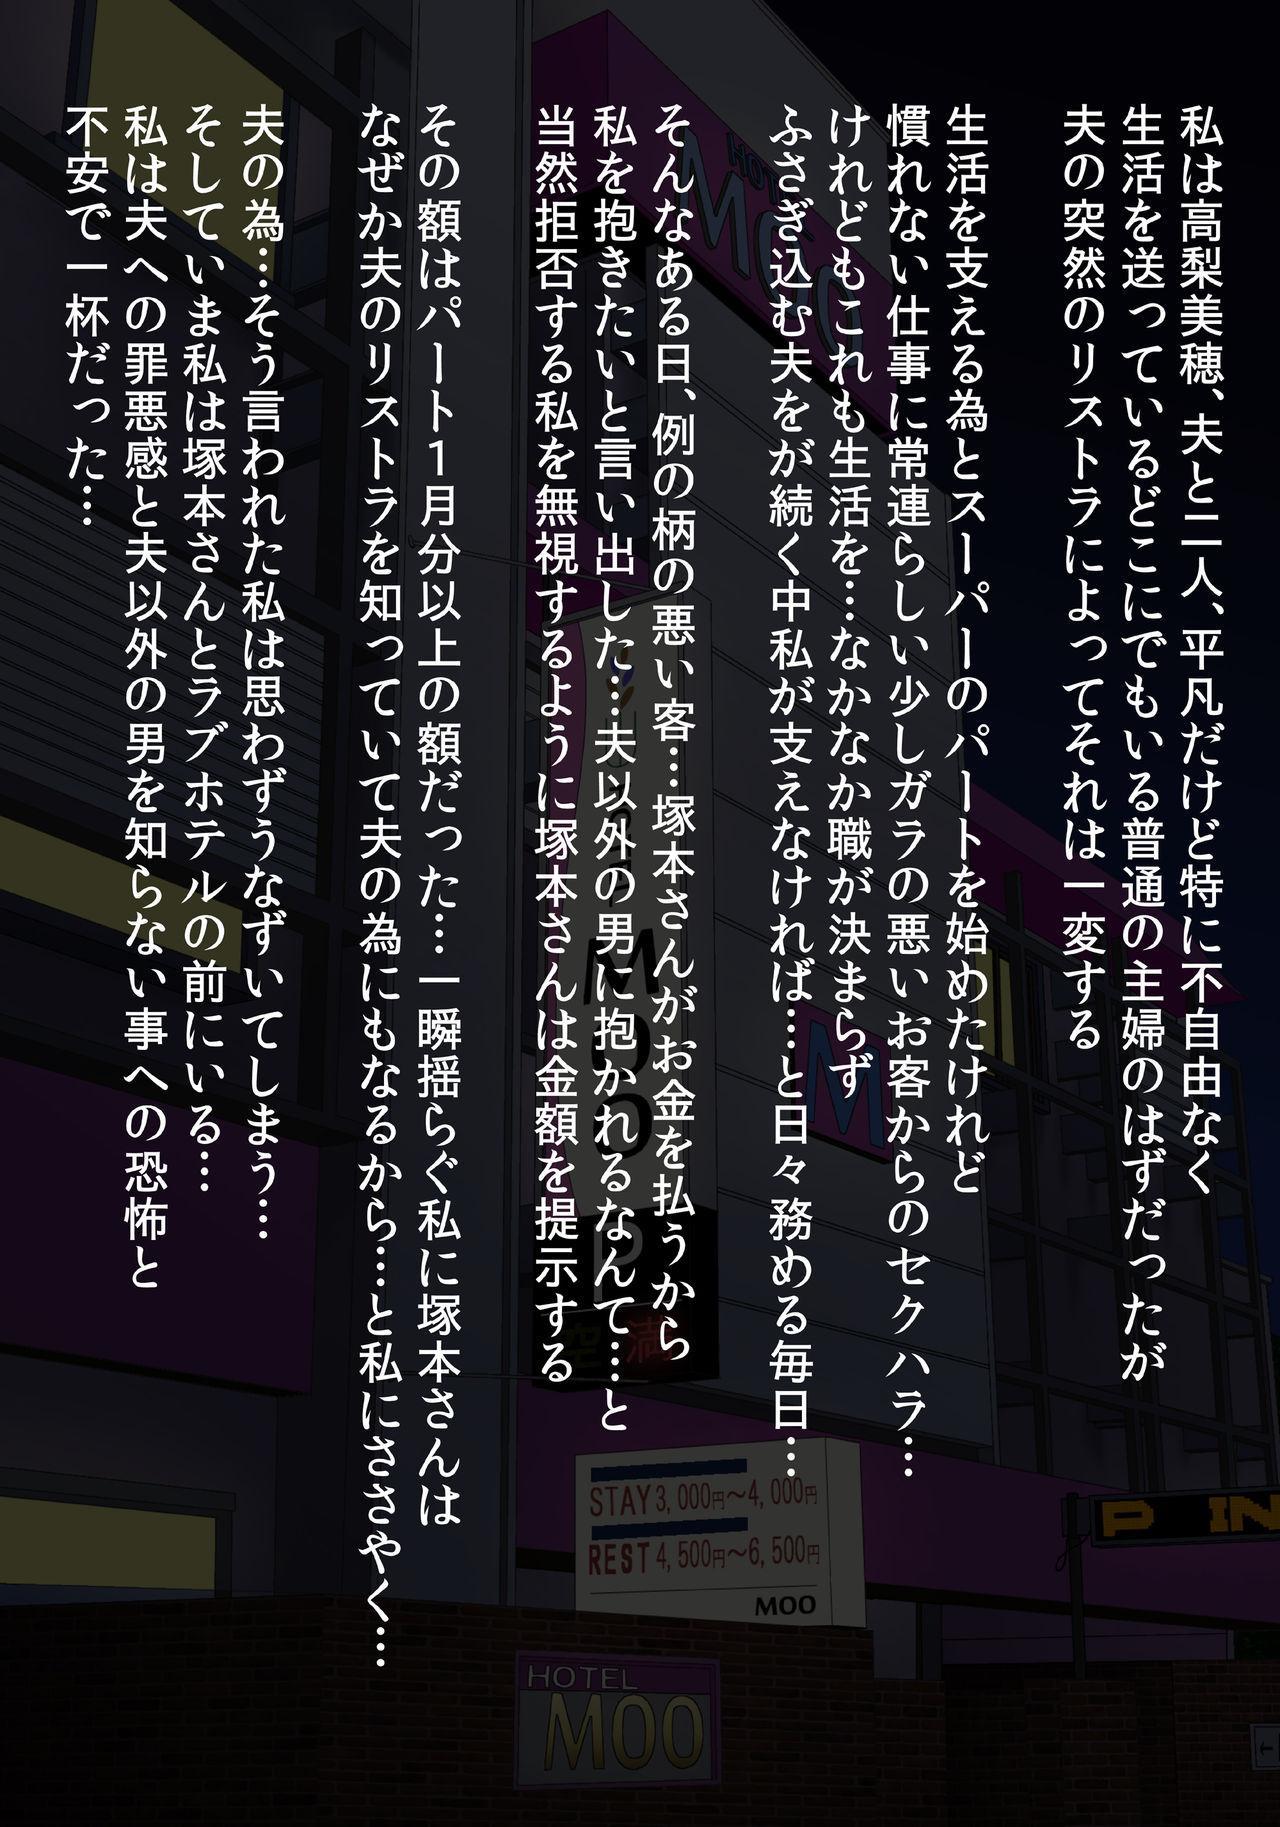 Kusurizuke! Sennou! Kikai Kaizou! Kuroochi Bitch-ka Heroine +α 252